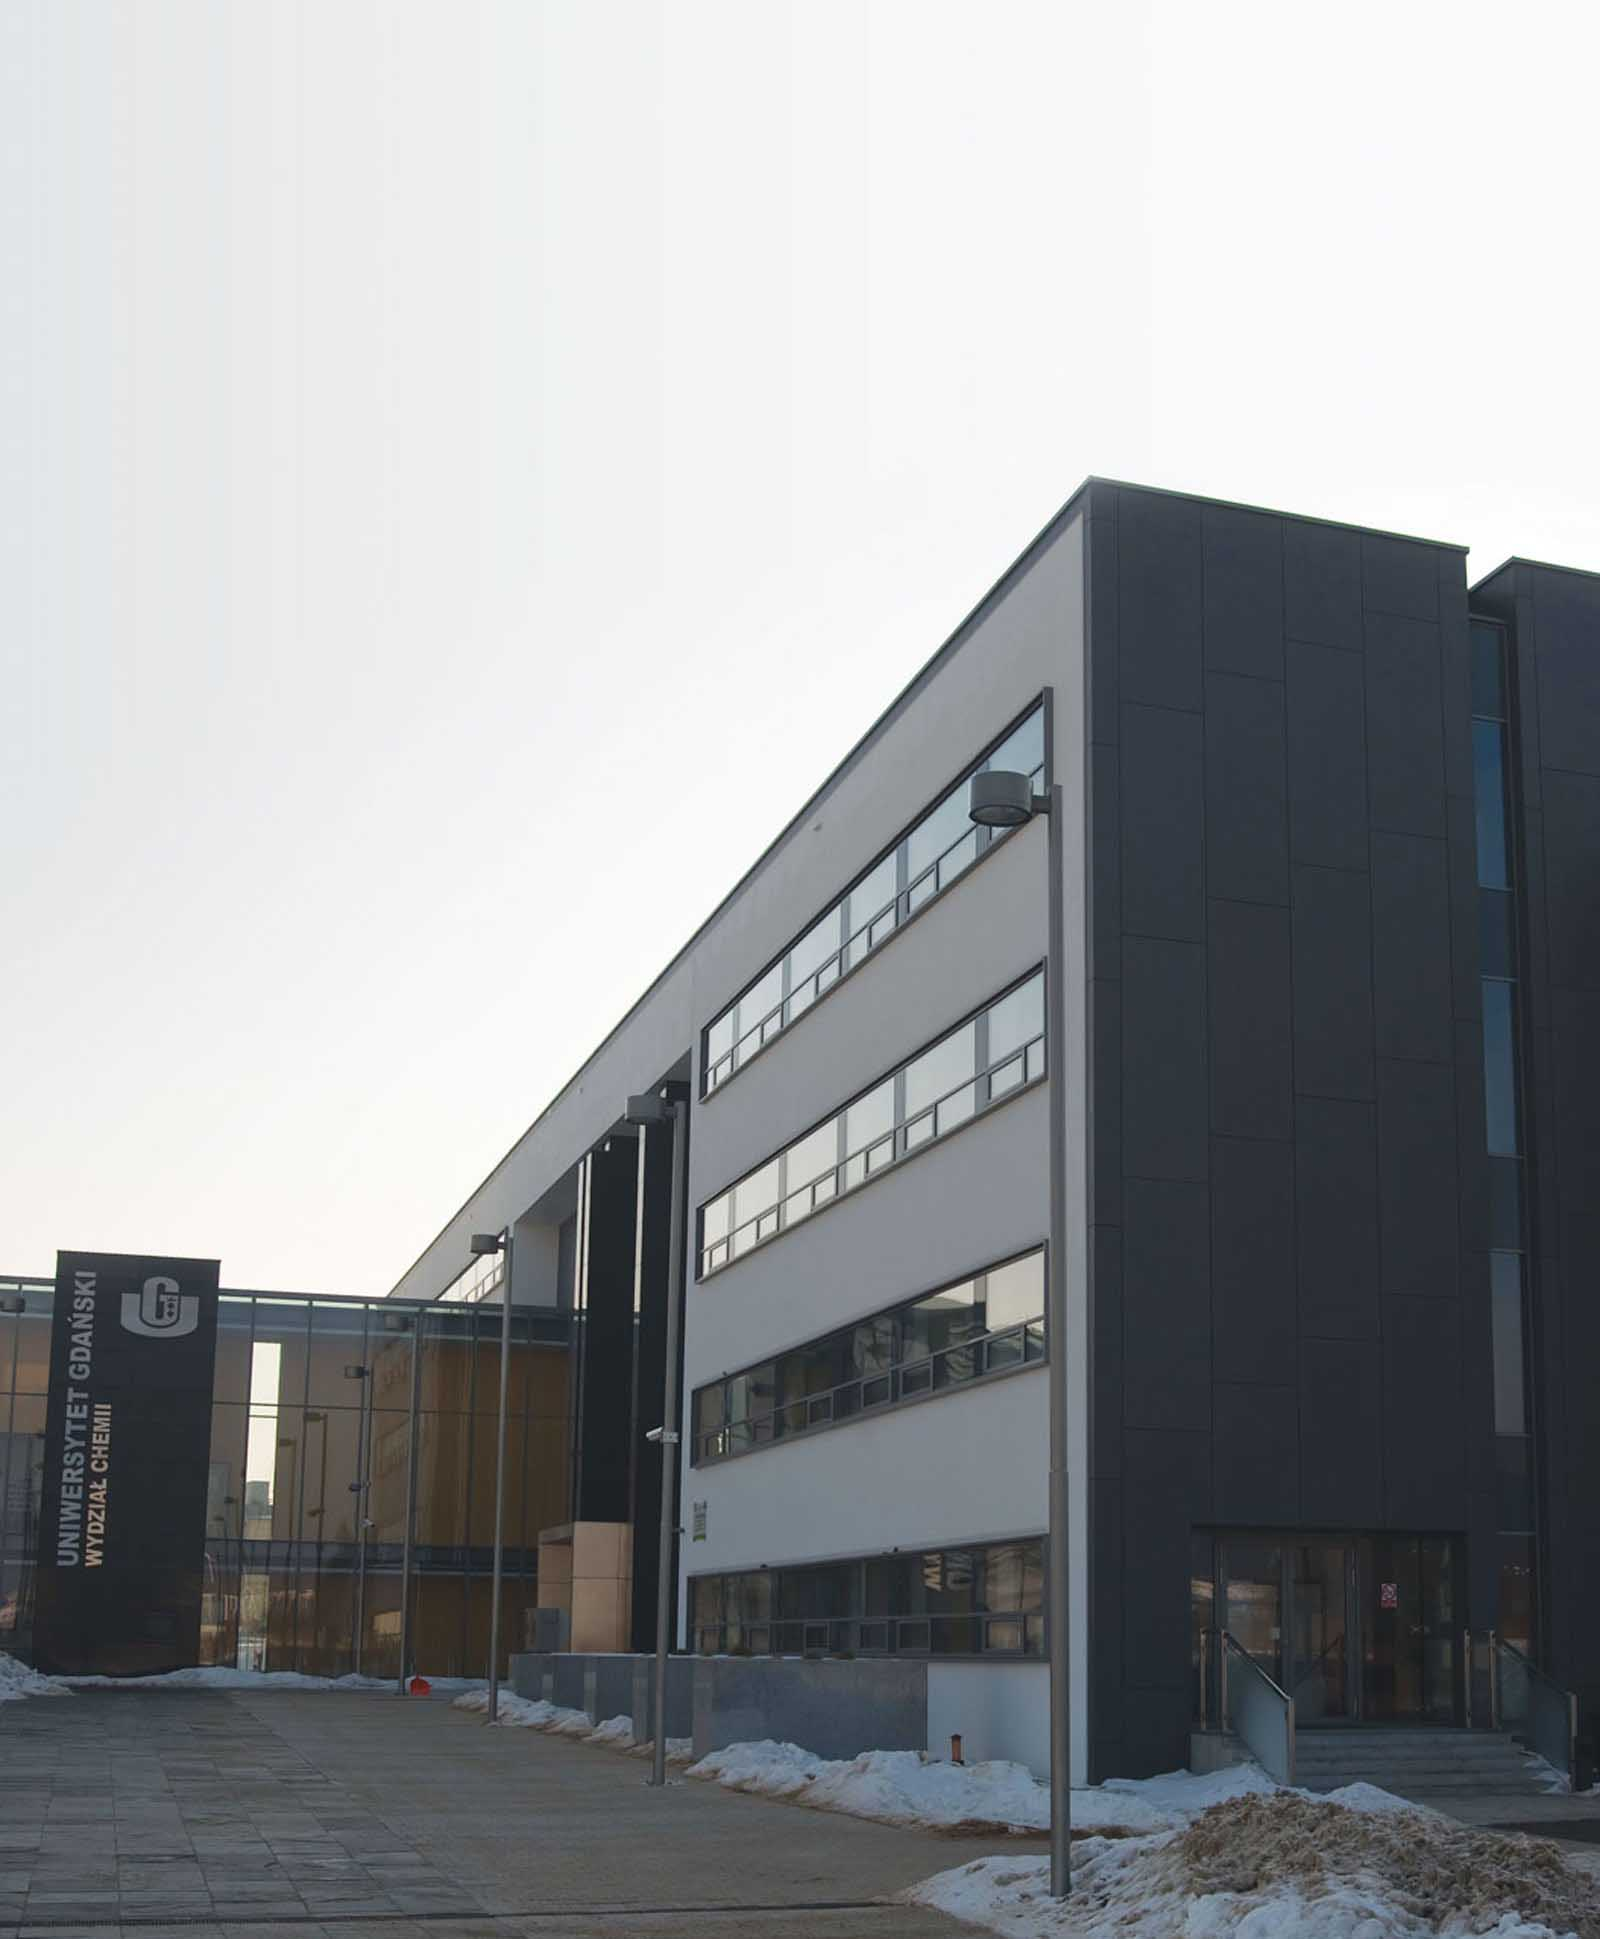 uniwersytet_gdanski_wydzial_chemii1